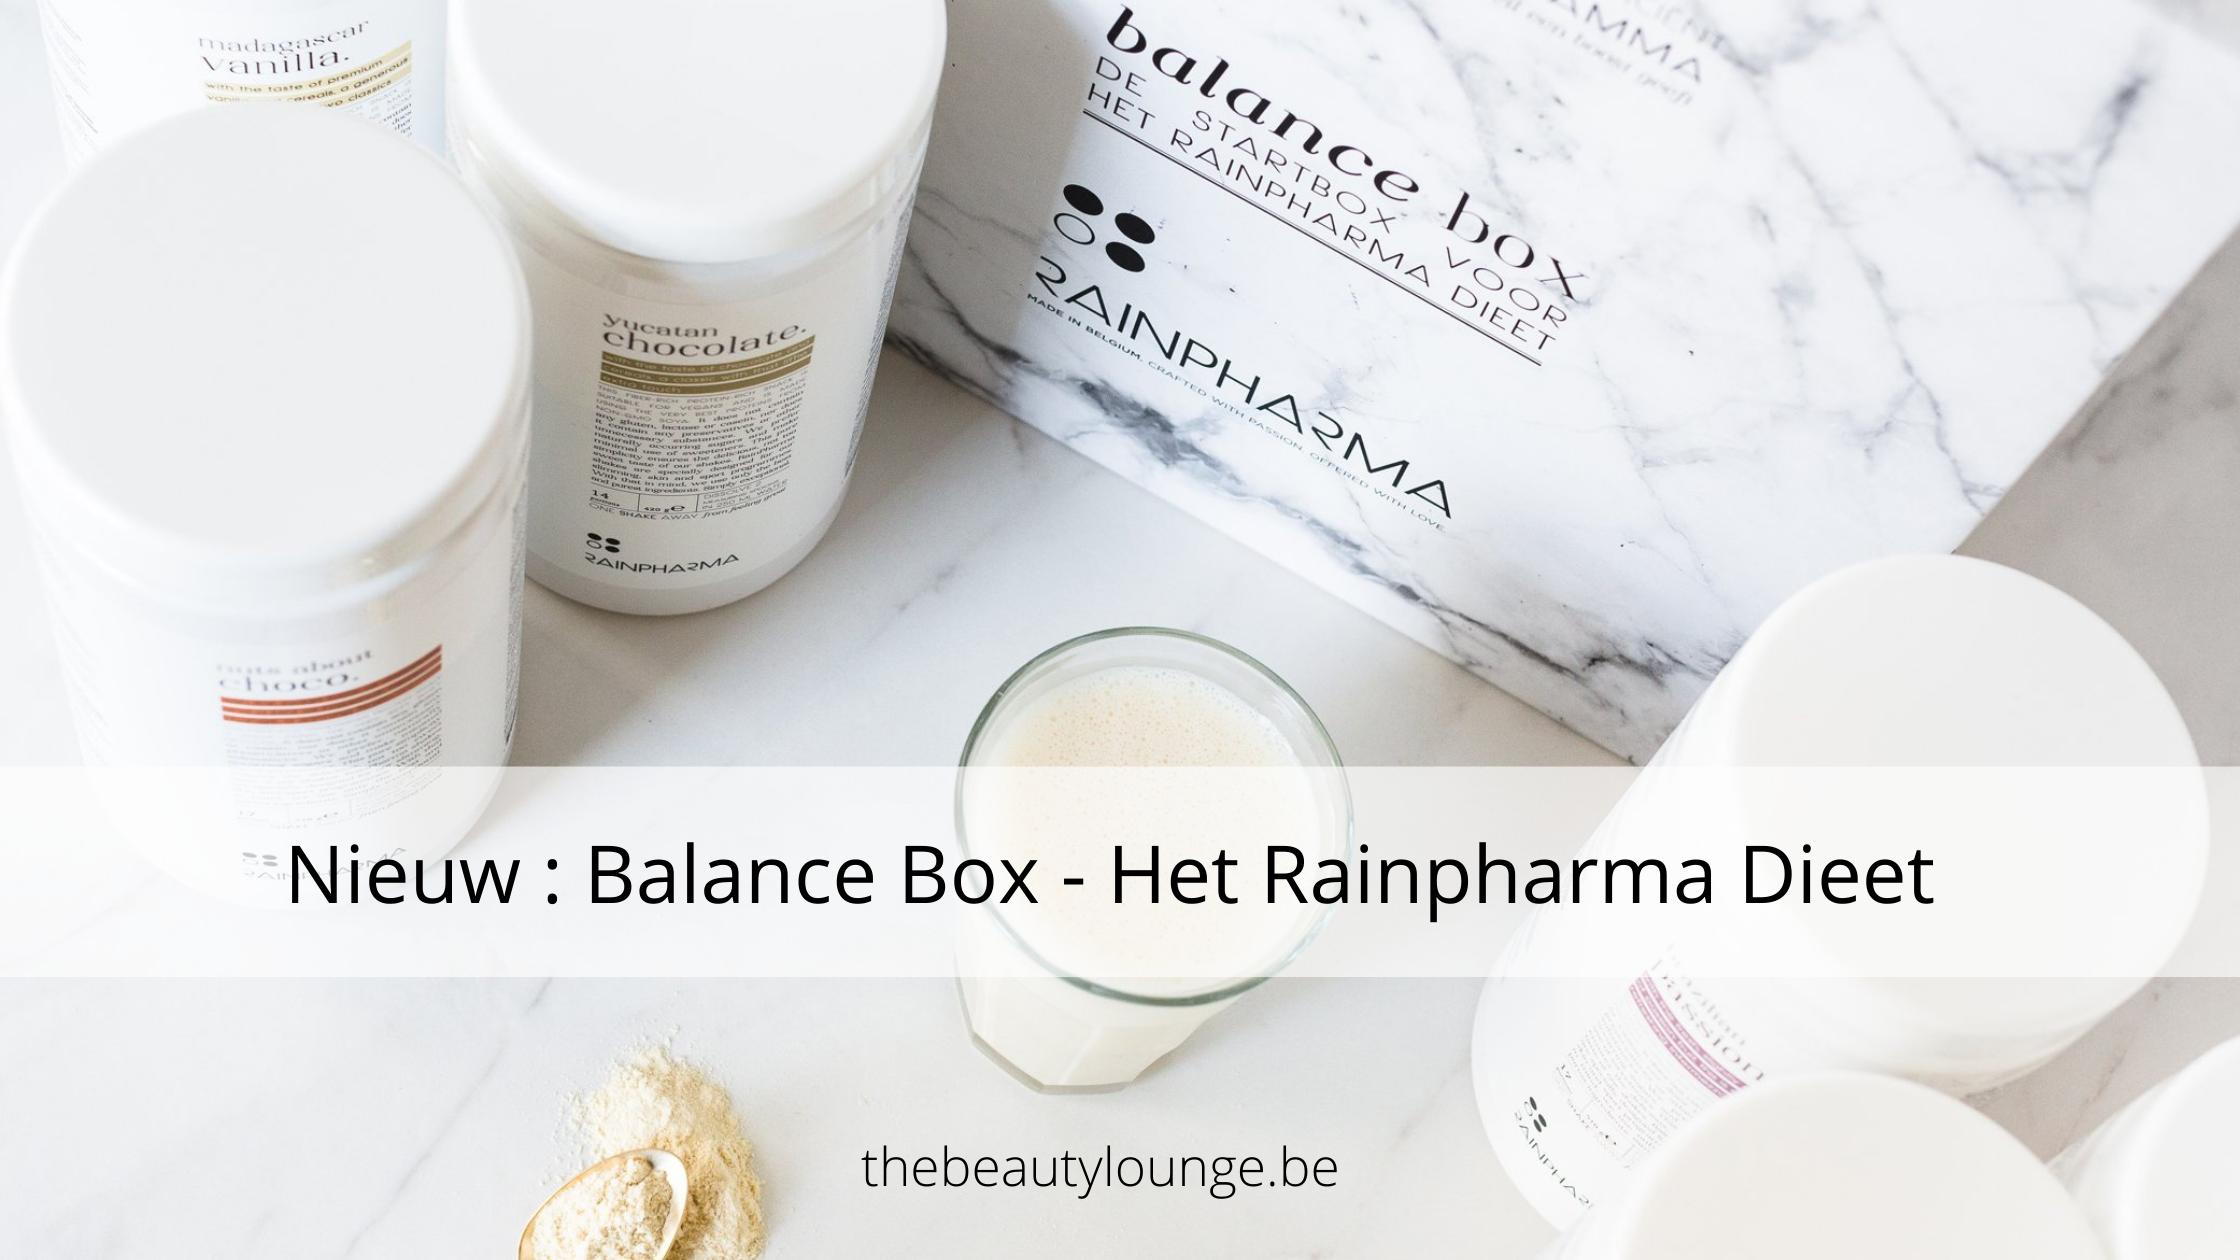 Nieuw : Balance Program – Rainpharma Dieet